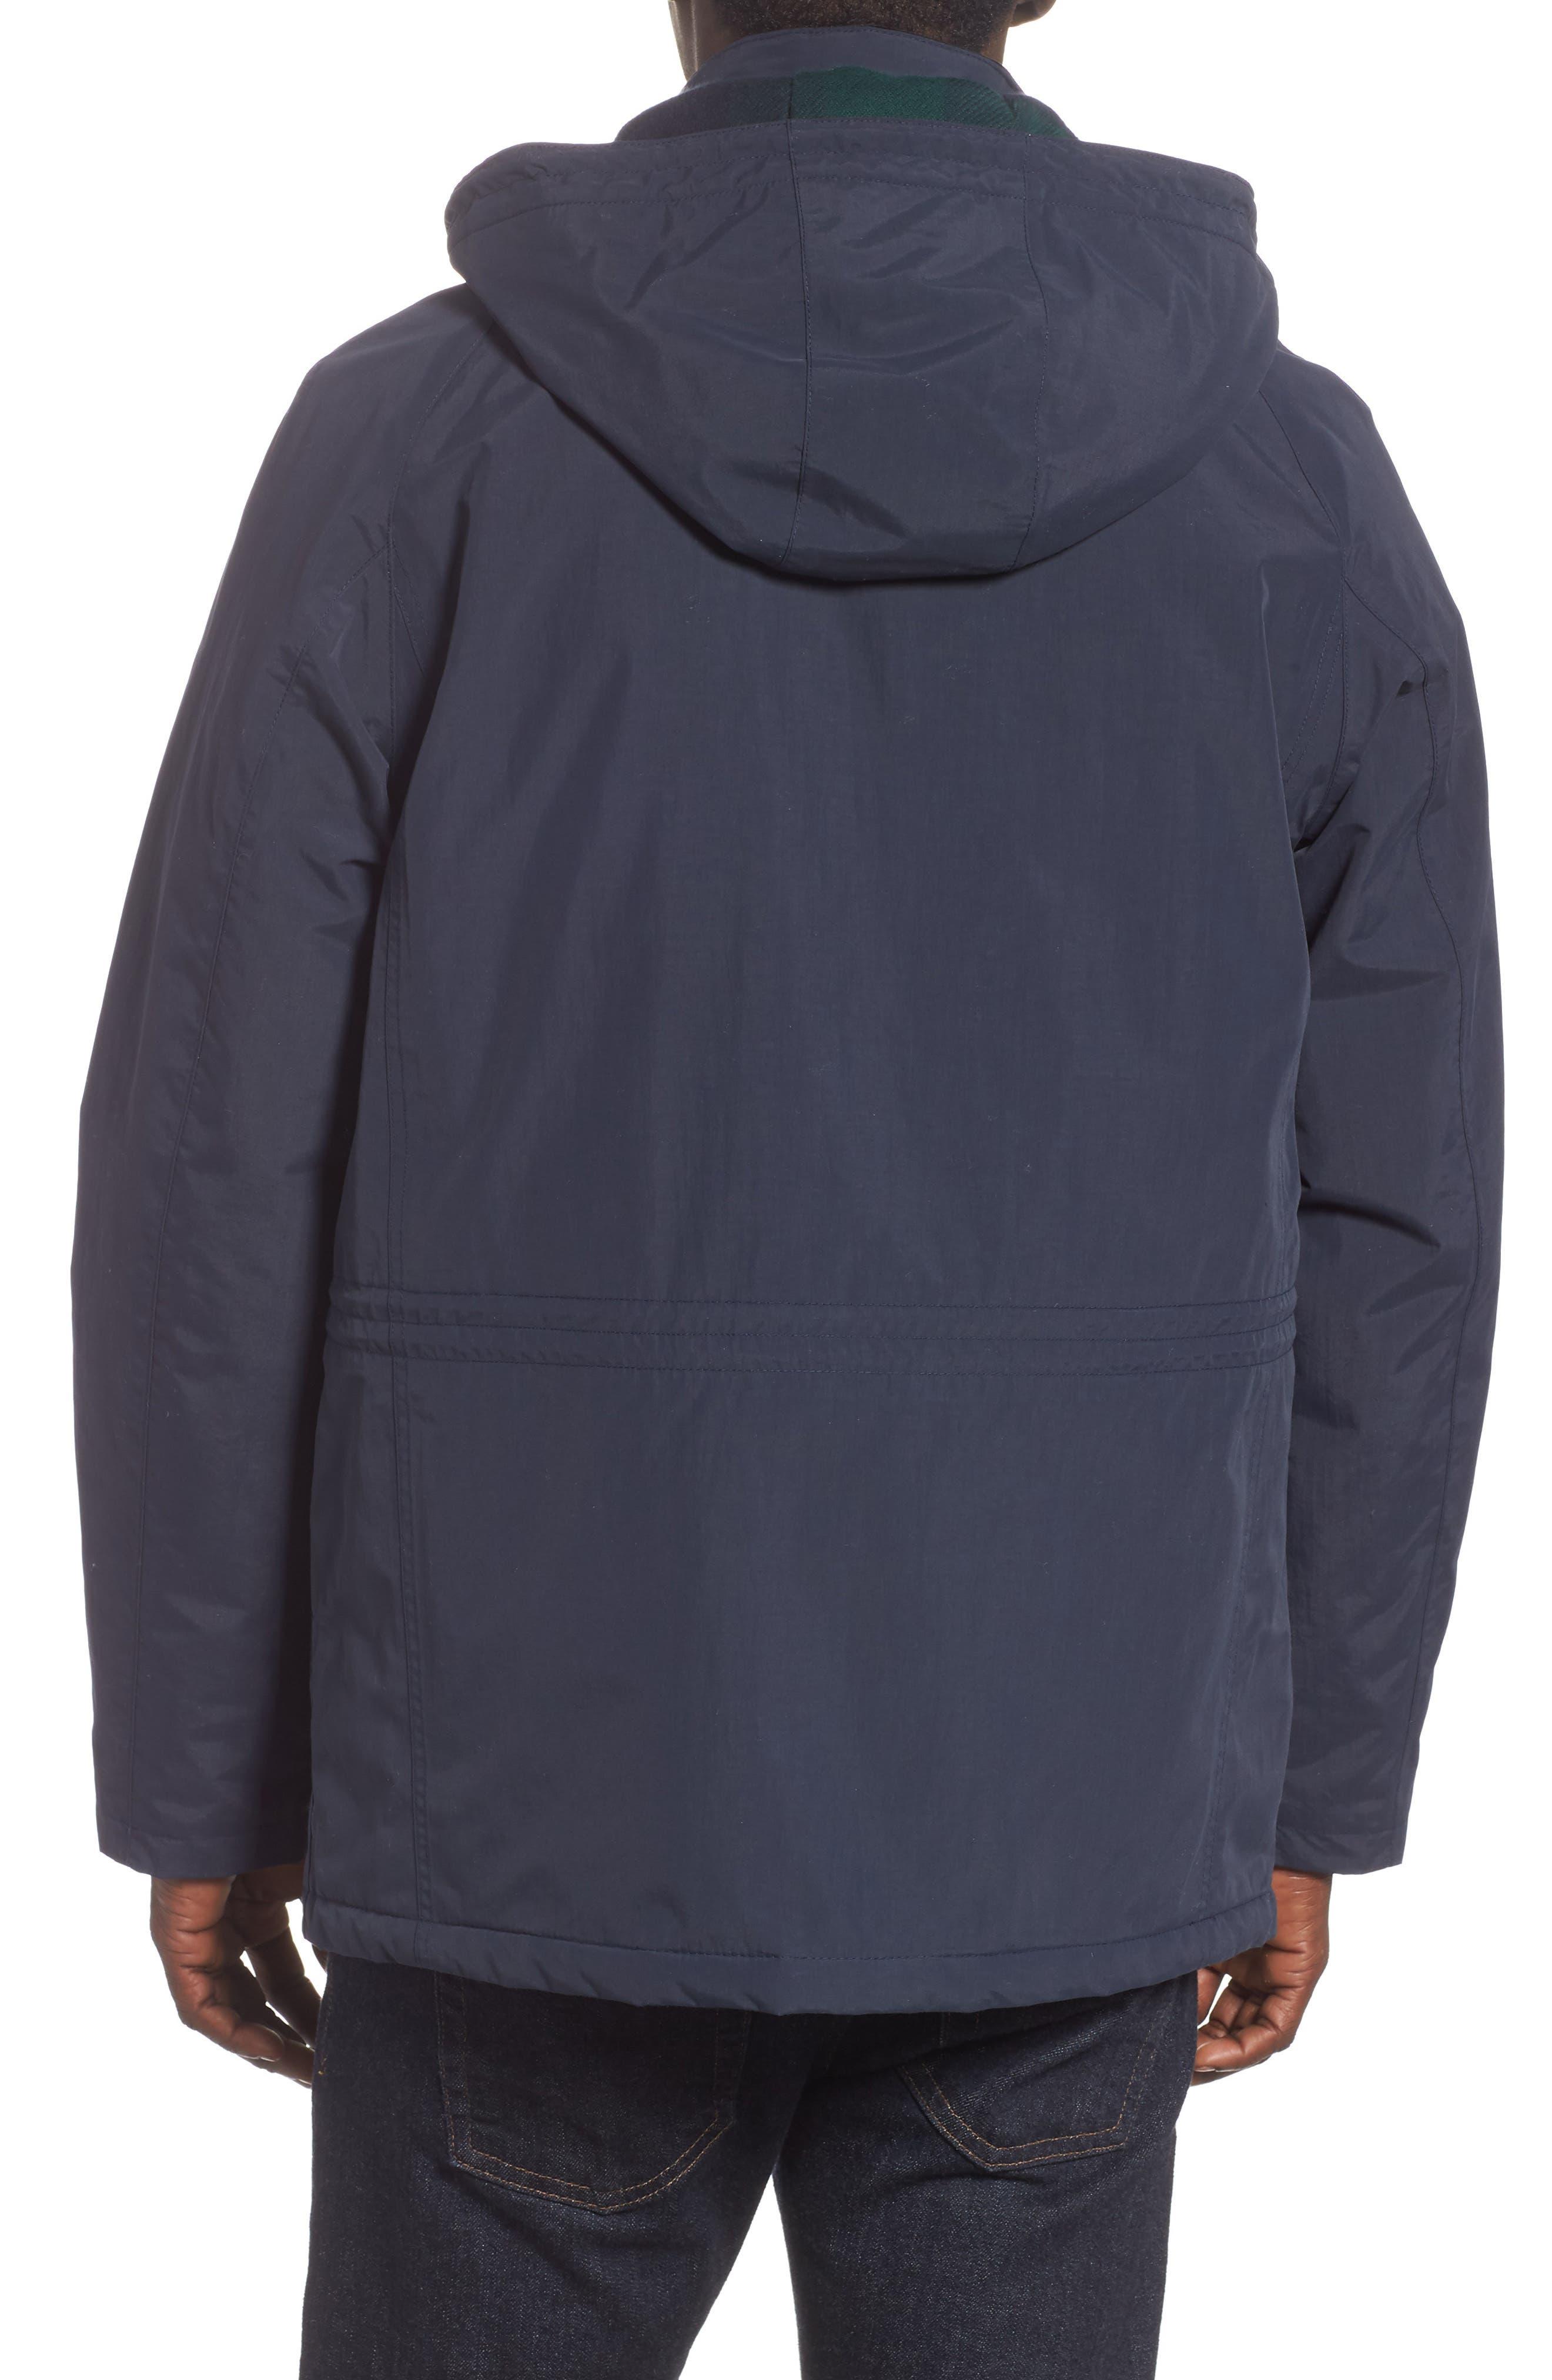 BARBOUR, Tiree Waterproof Jacket, Alternate thumbnail 2, color, 410